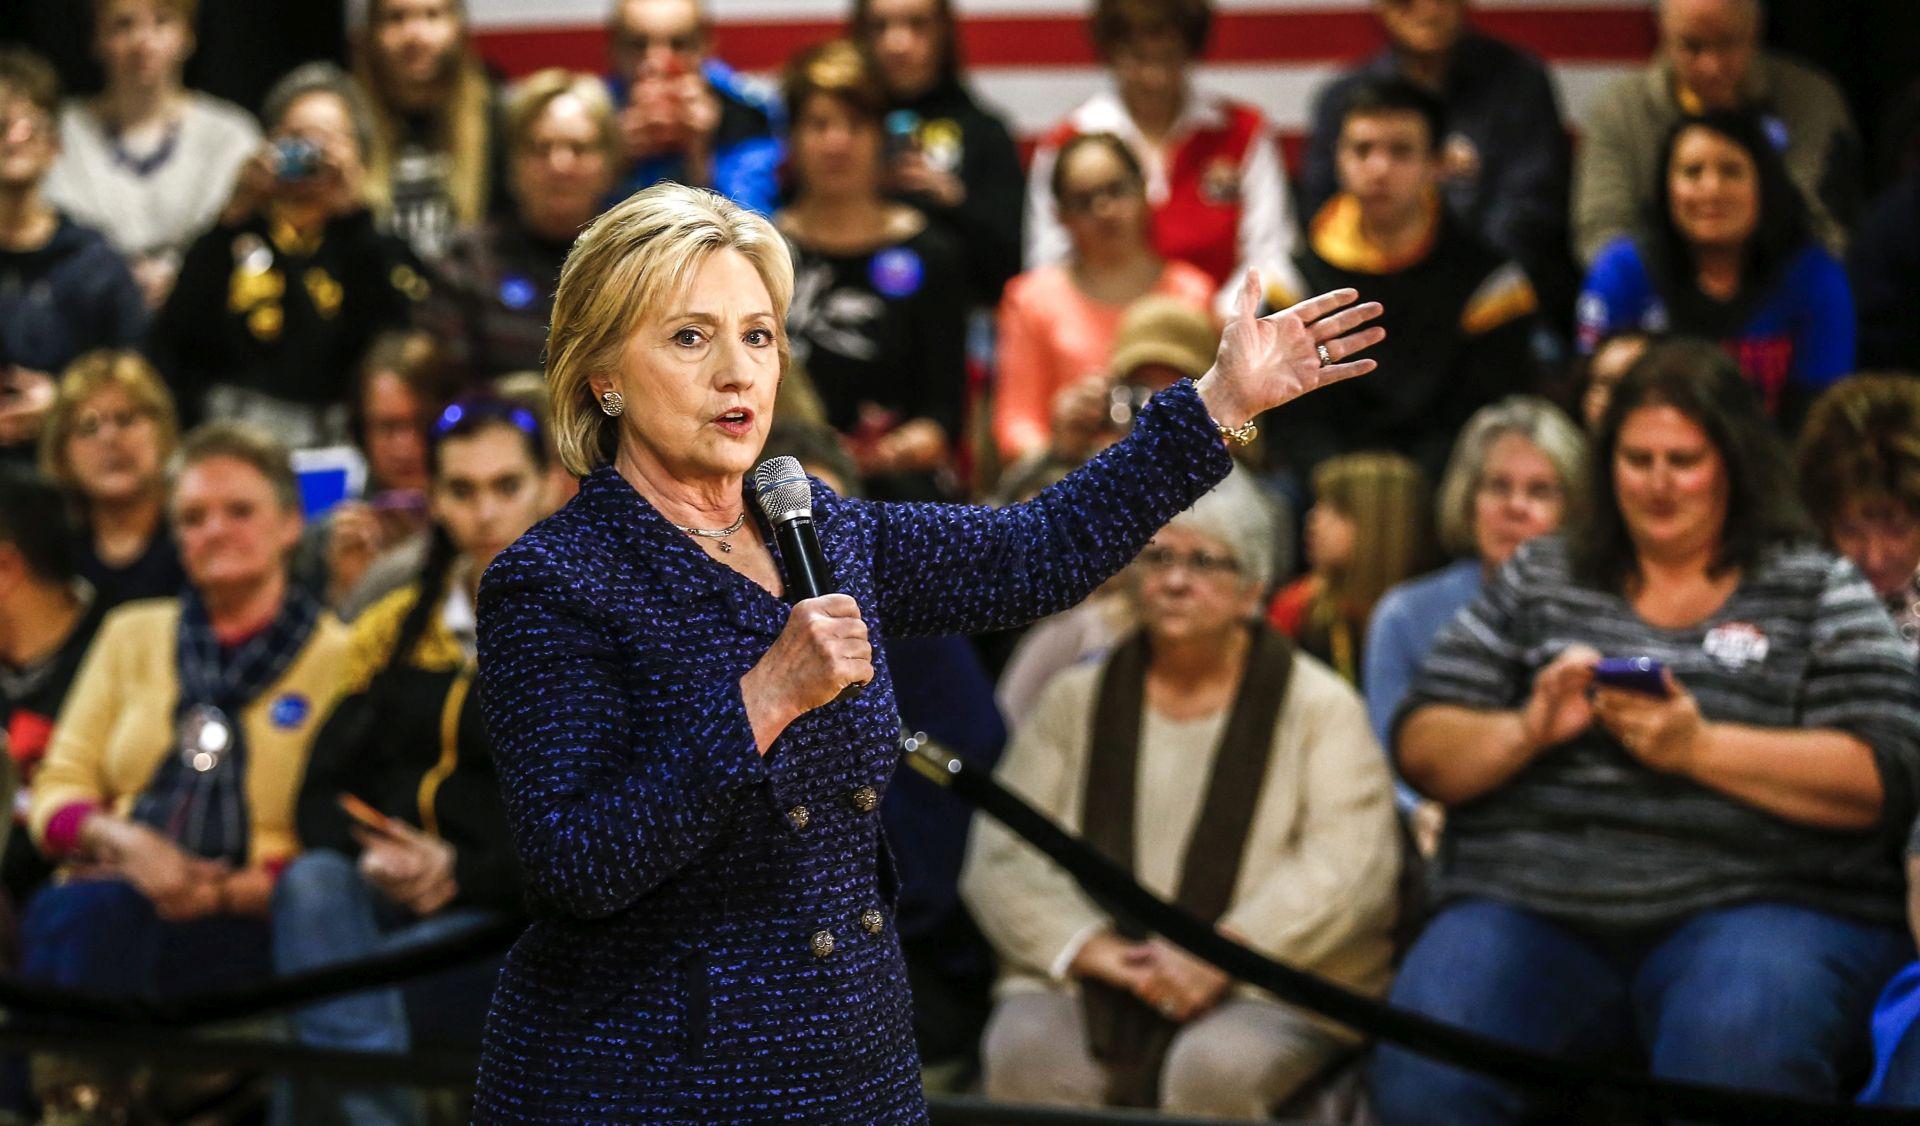 PREDSJEDNIČKA UTRKA: Obama pohvalio bogato iskustvo Clinton